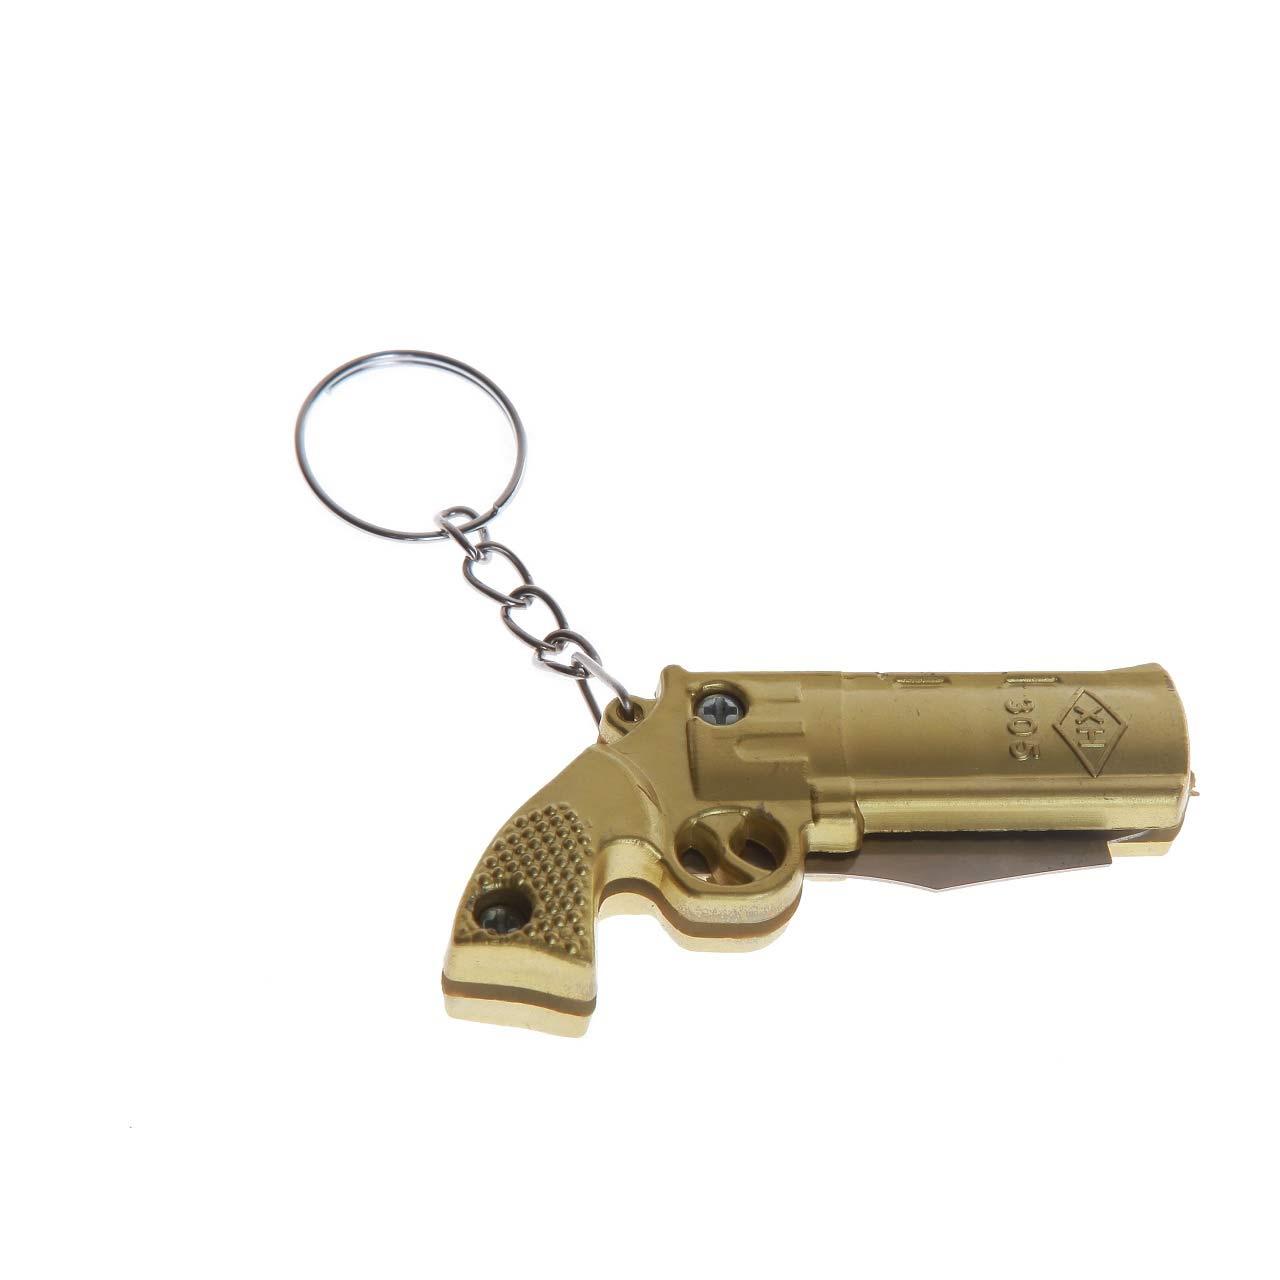 جاسوییچی طرح تفنگ مدل چاقو ضامن دار کد 14